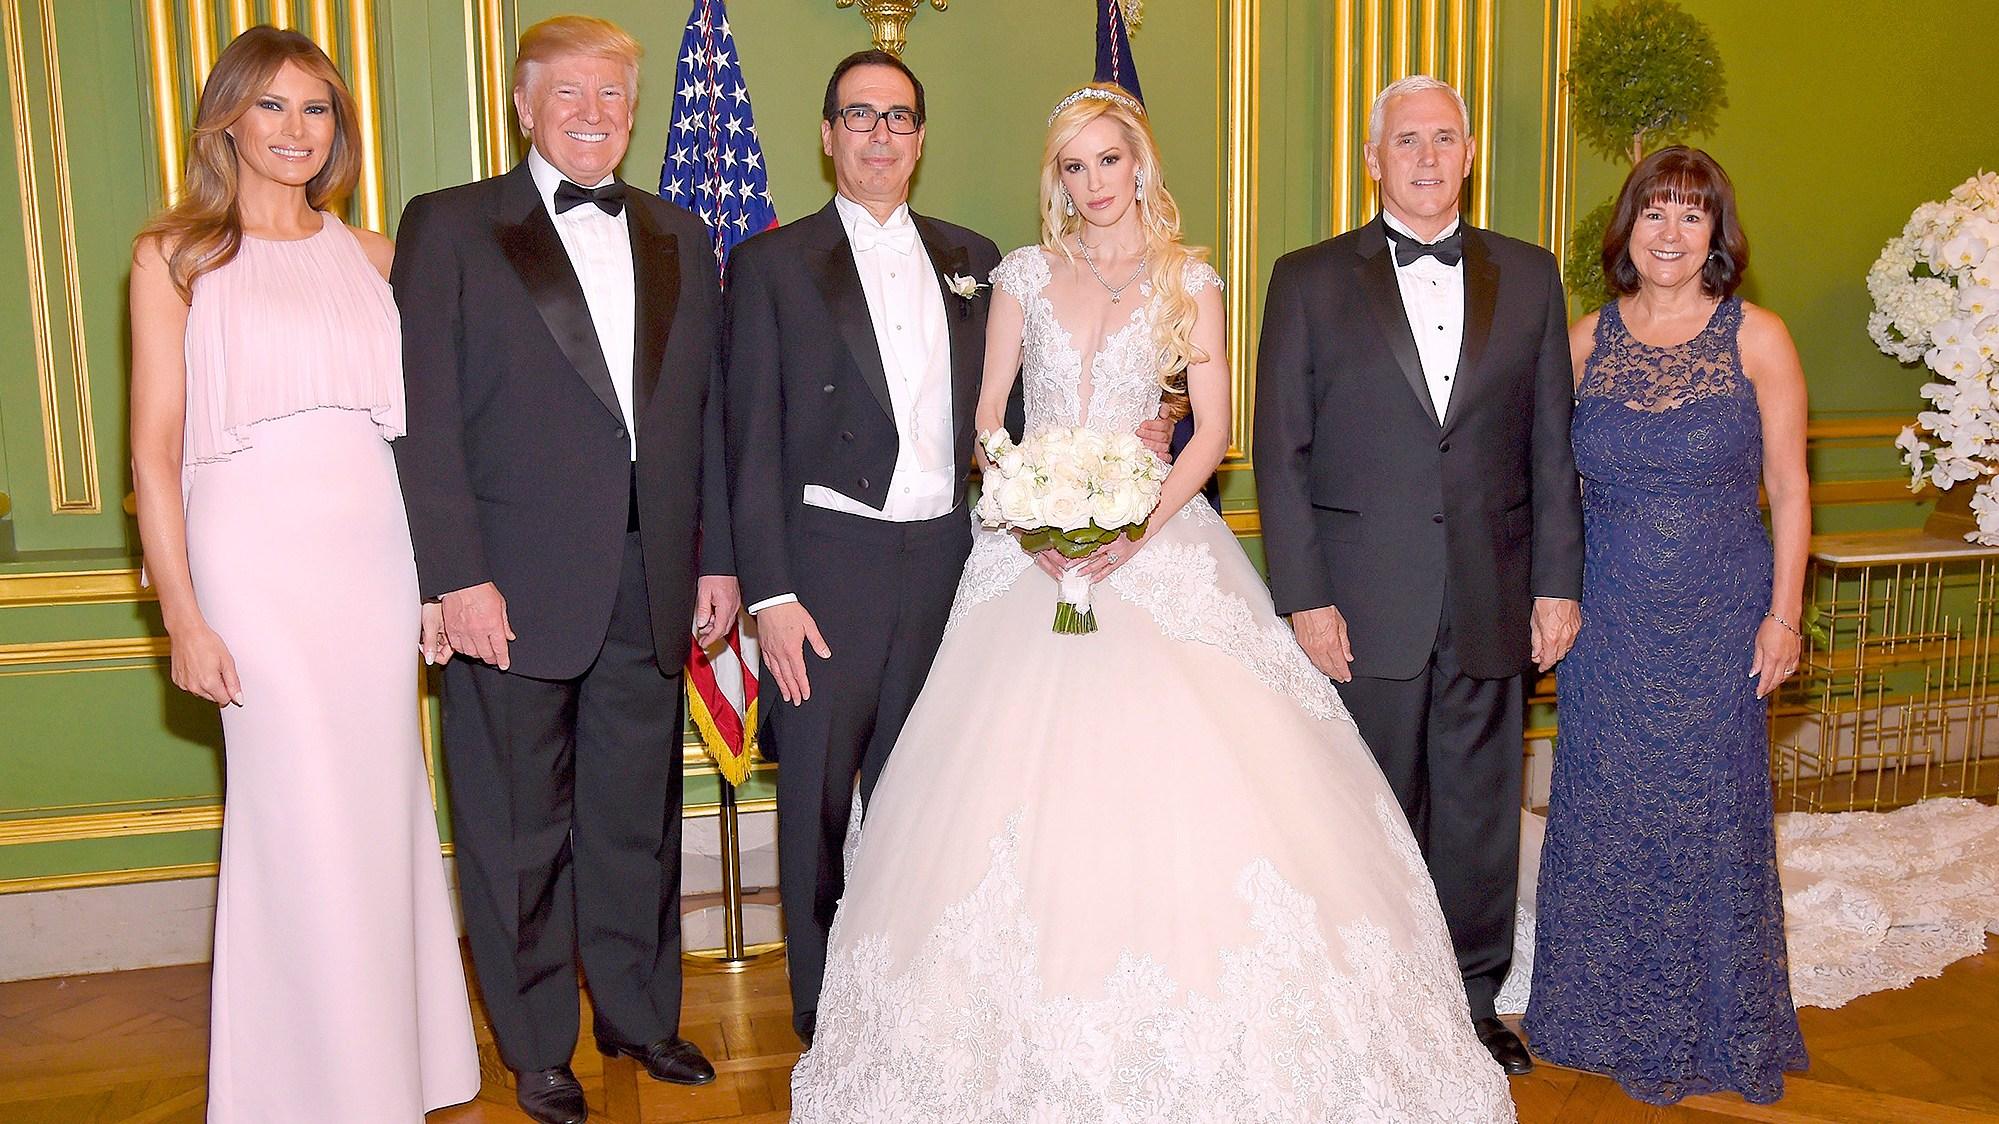 Melania Trump, Donald Trump, Steven Mnuchin, Louise Linton, Mike Pence and Karen Pence